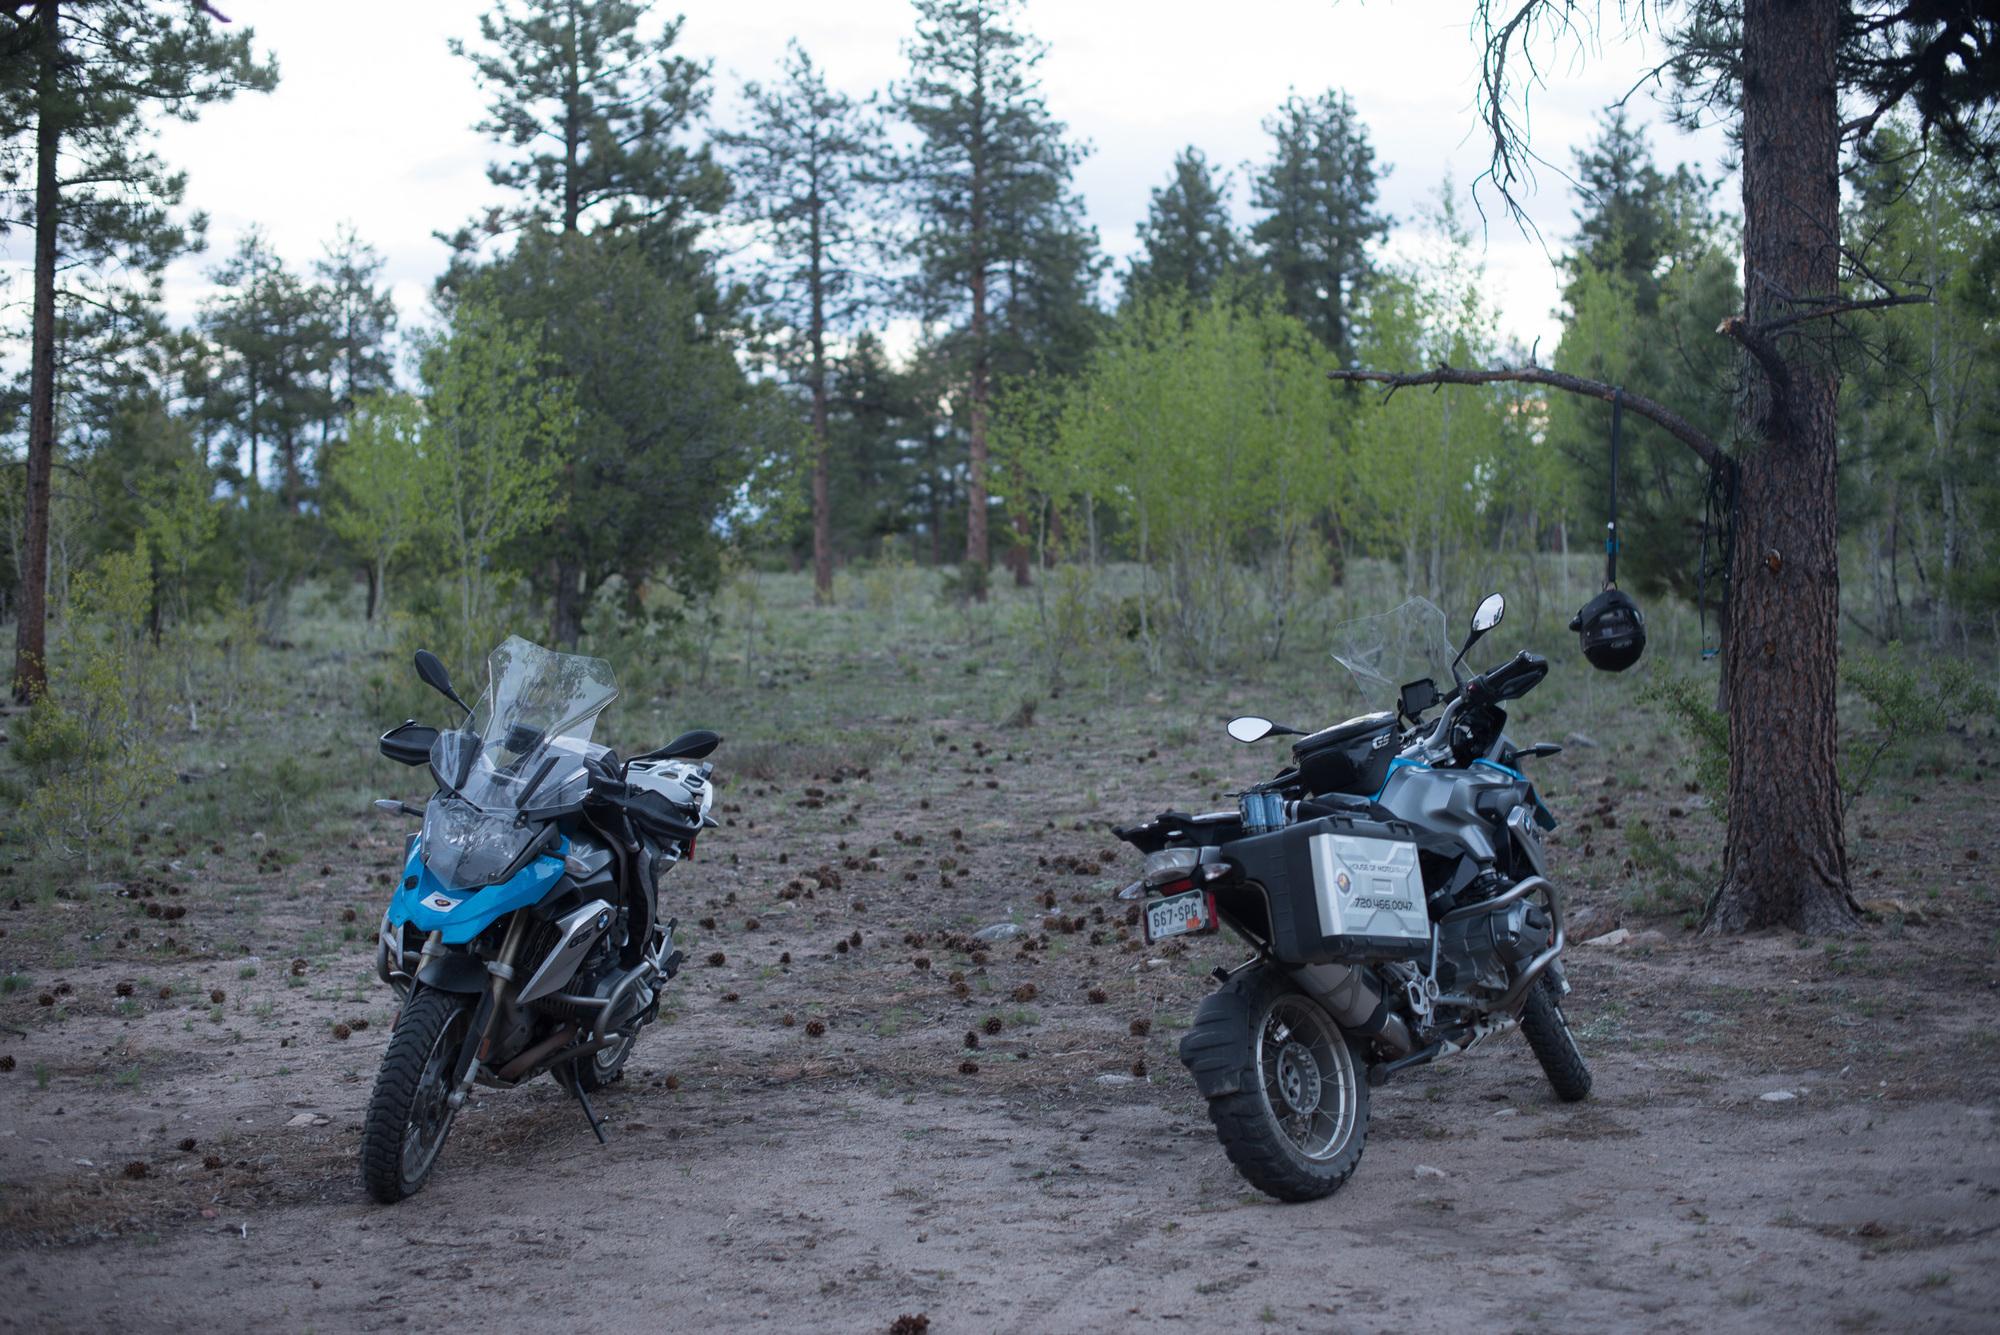 arkansas off road motorcycle riding